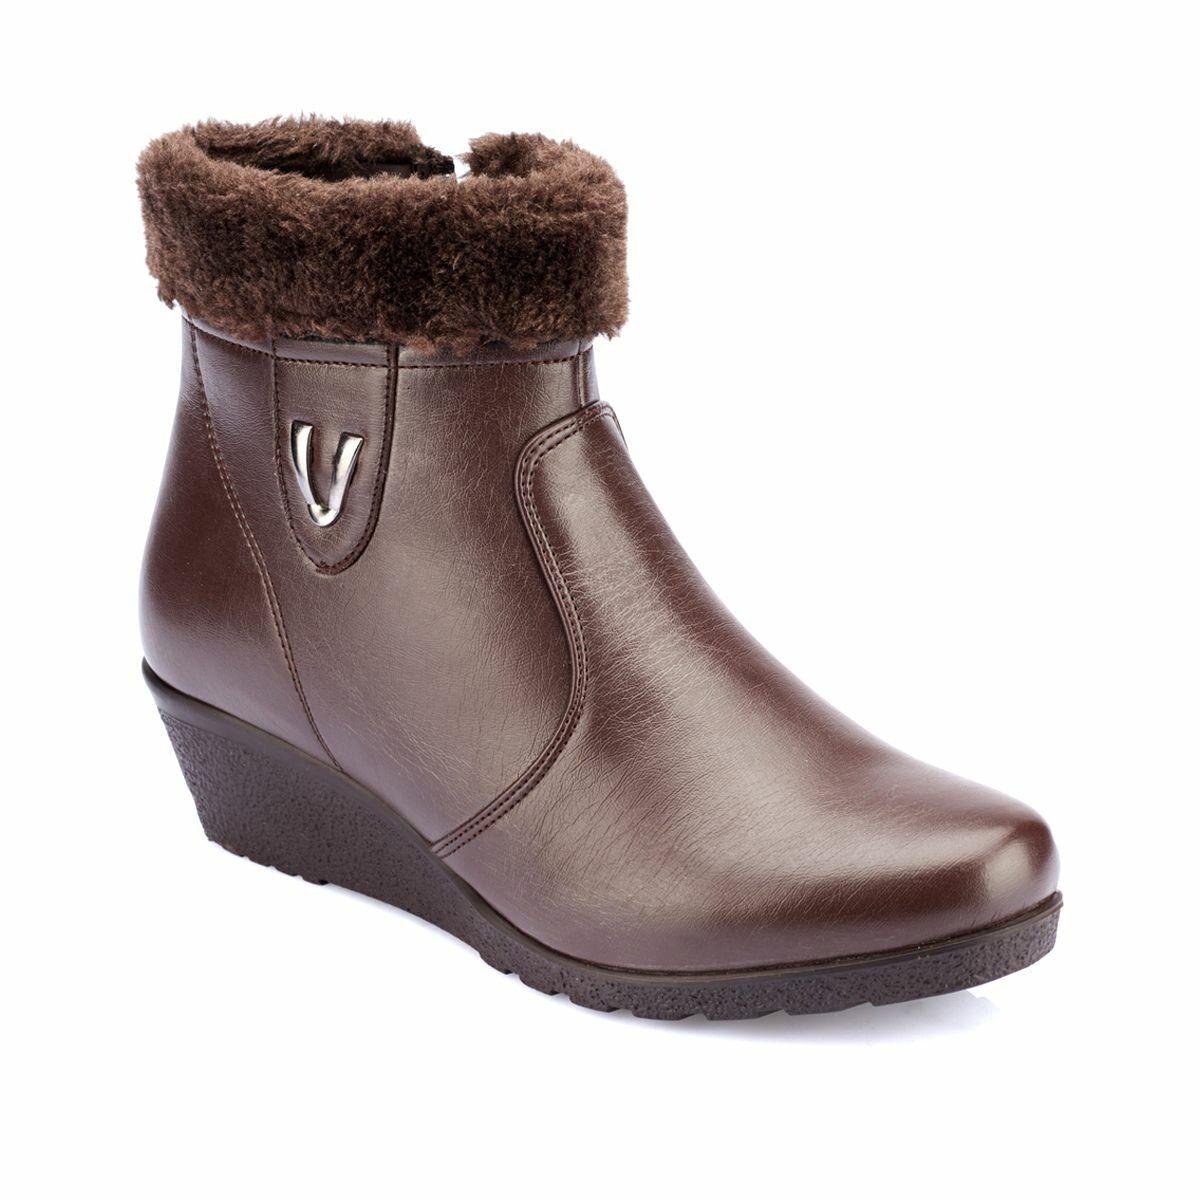 FLO 82. 150367.Z Brown Women 'S Boots Polaris